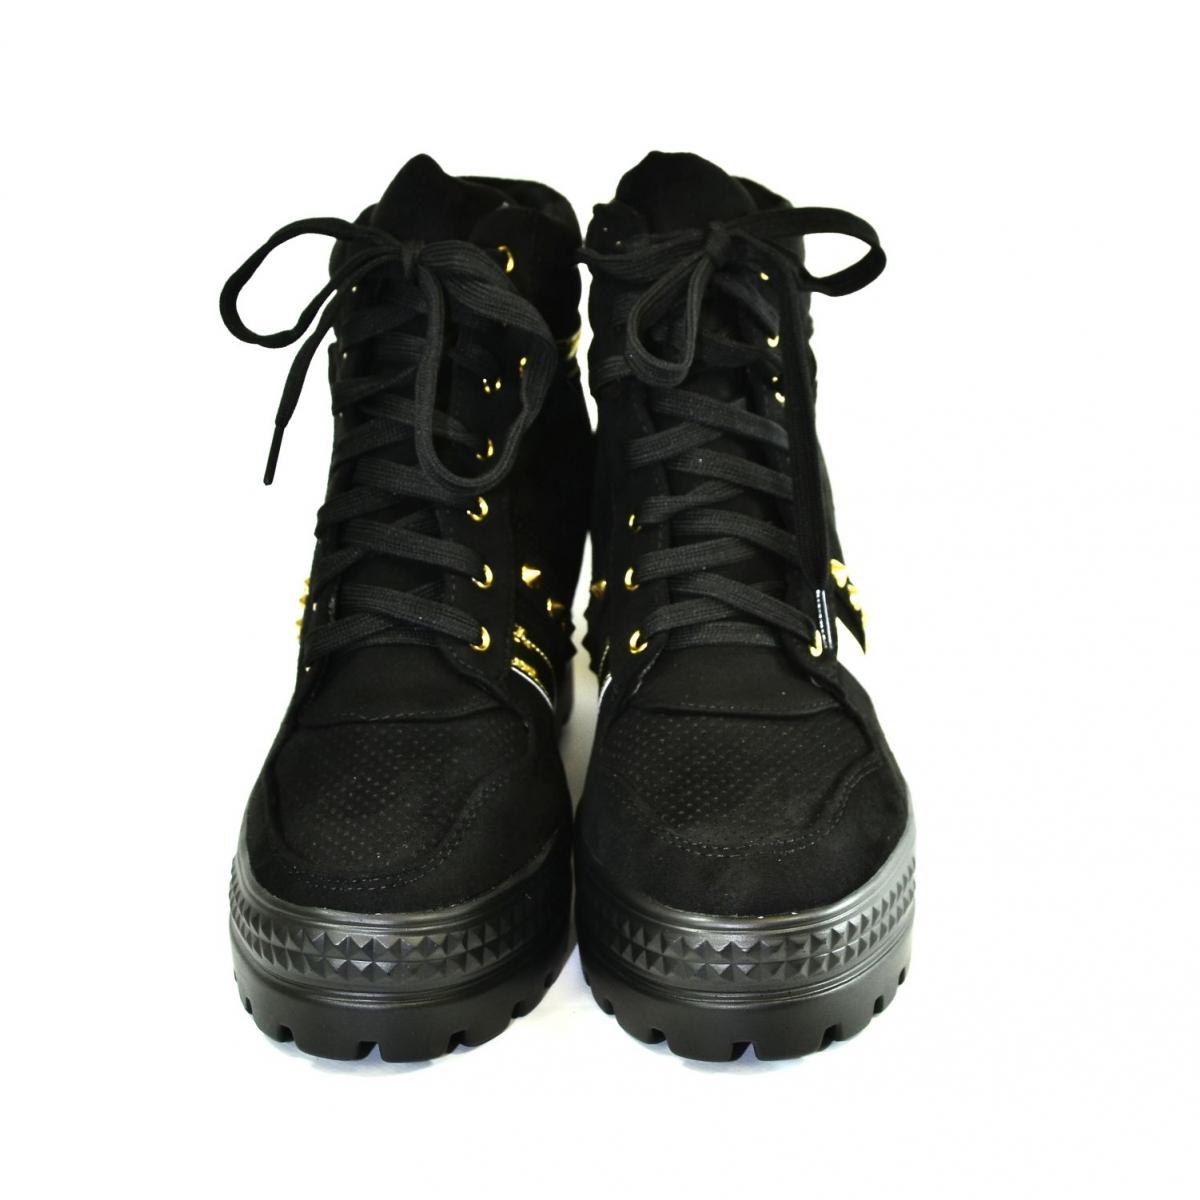 d0ea349da1ca Dámske čierne topánky VIANA - 3